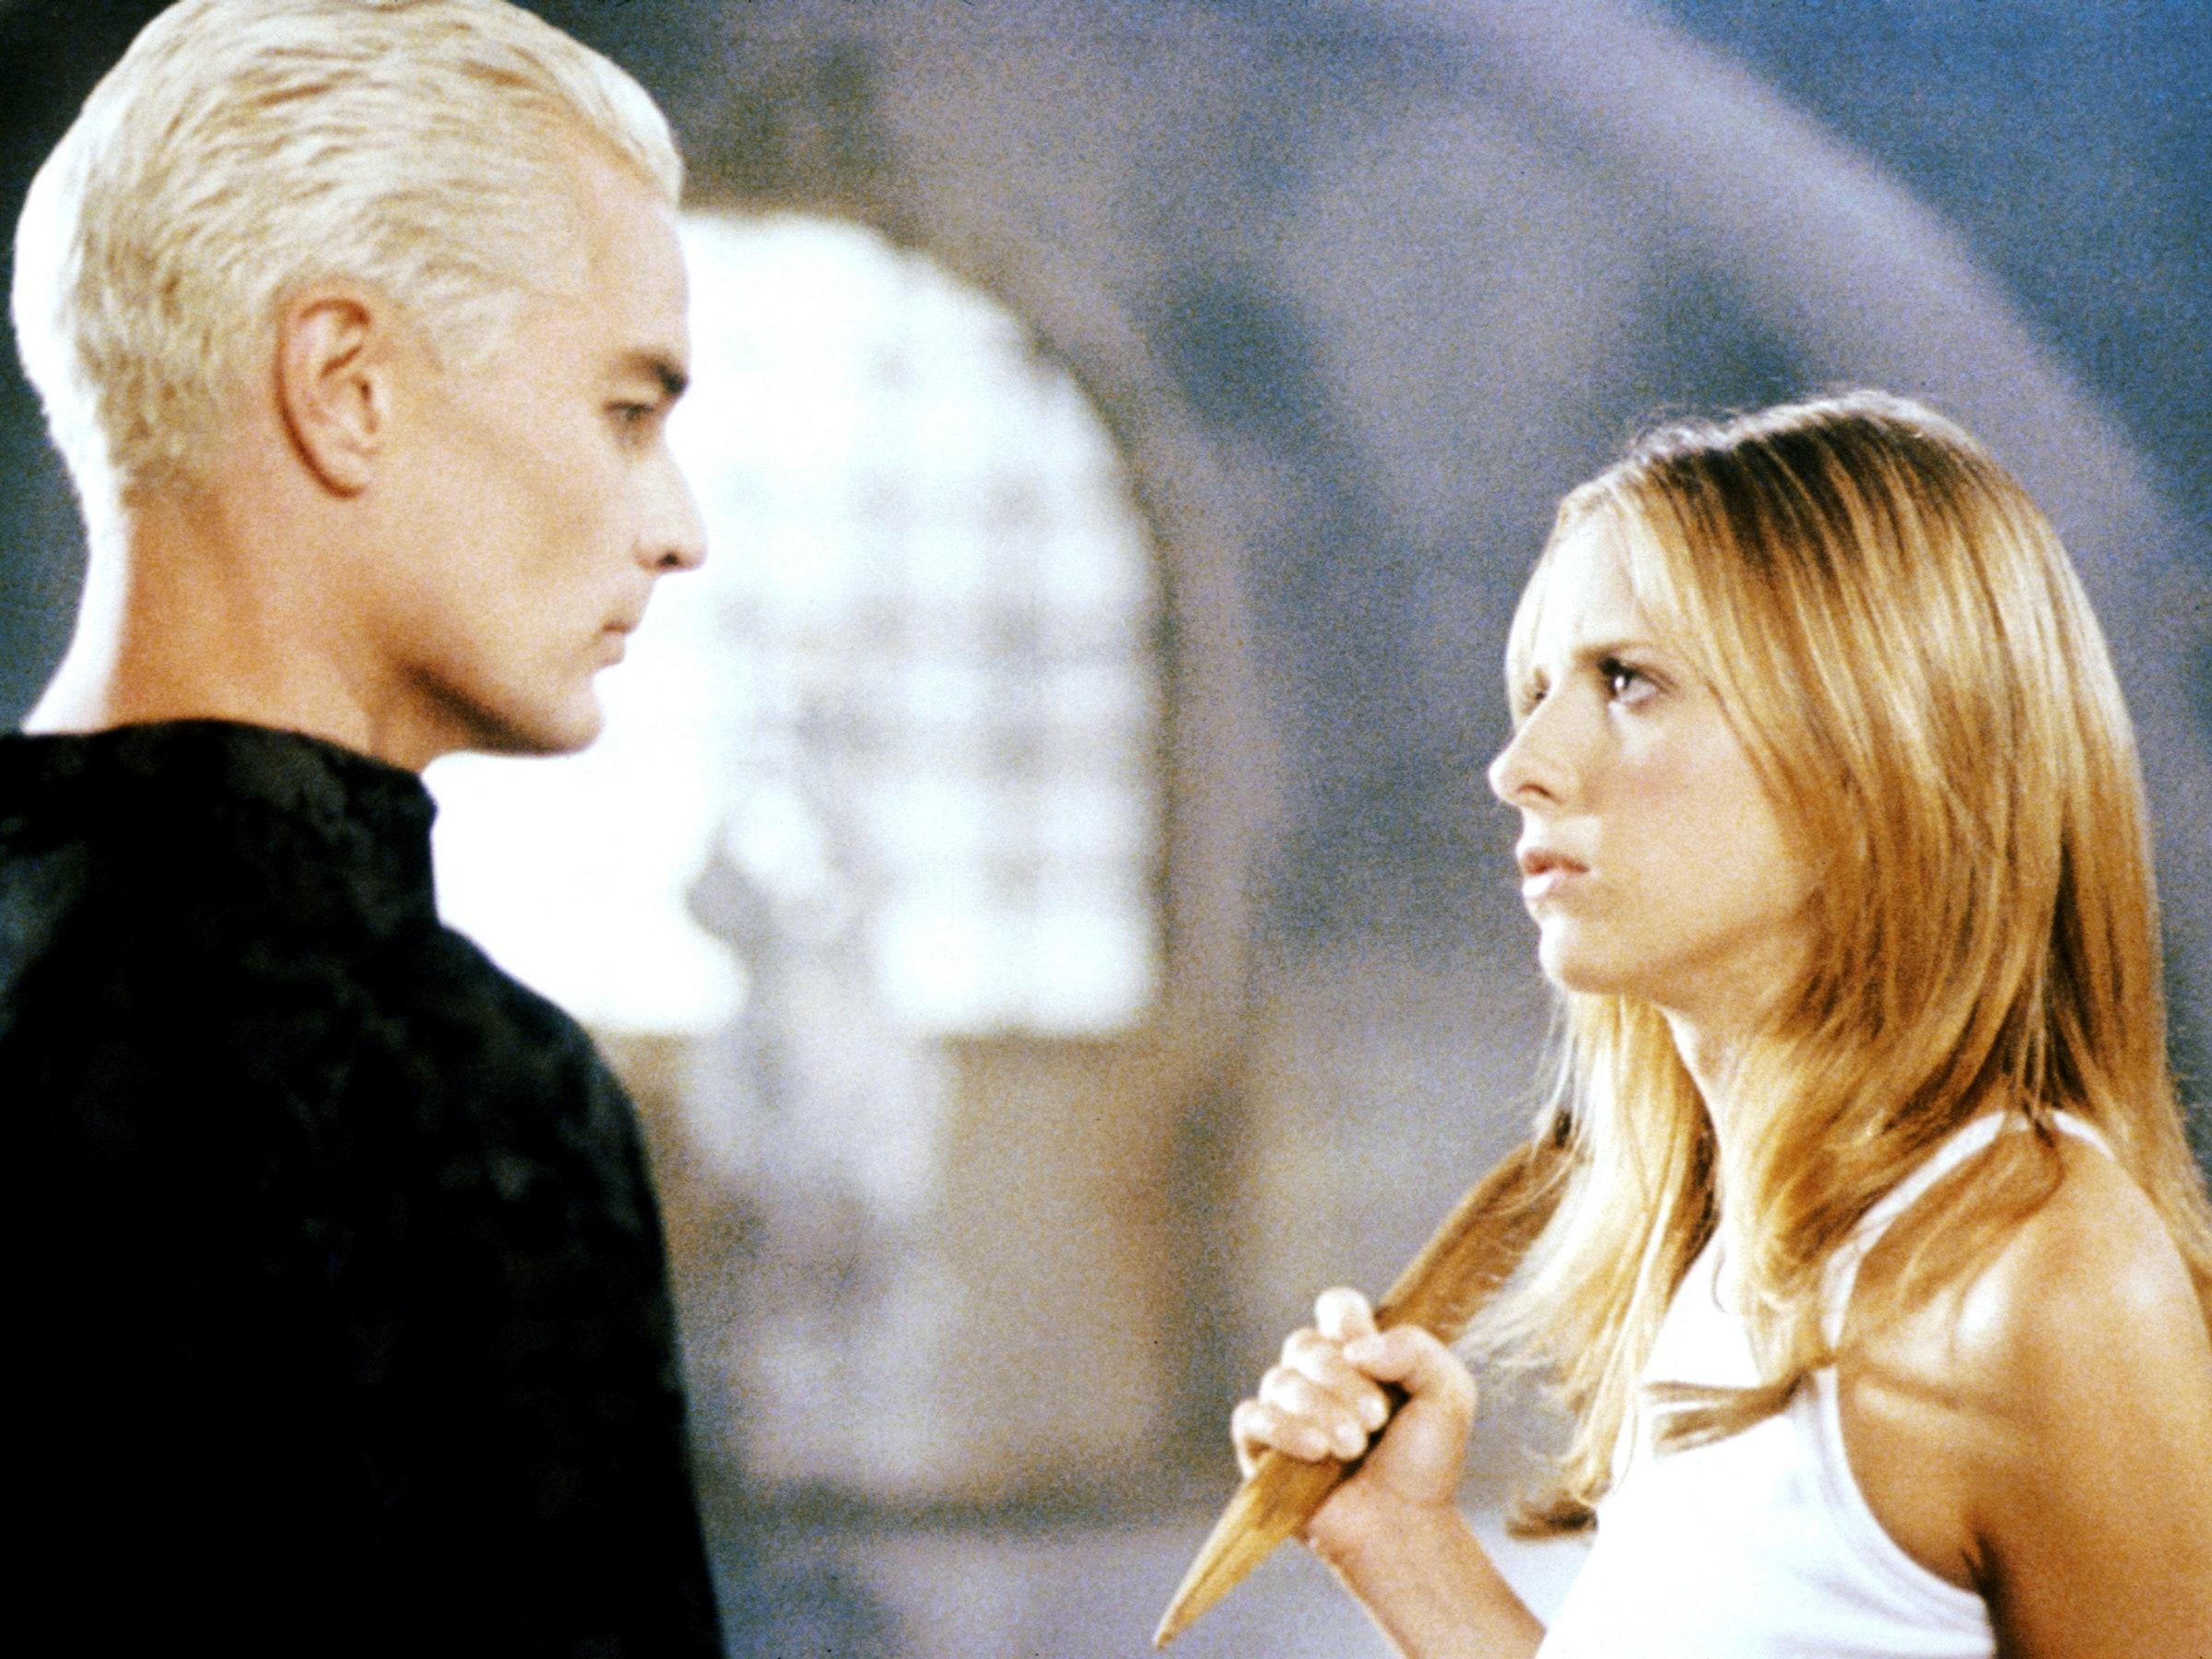 Баффи — истребительница вампиров (Buffy the Vampire Slayer) 1997 - 2003